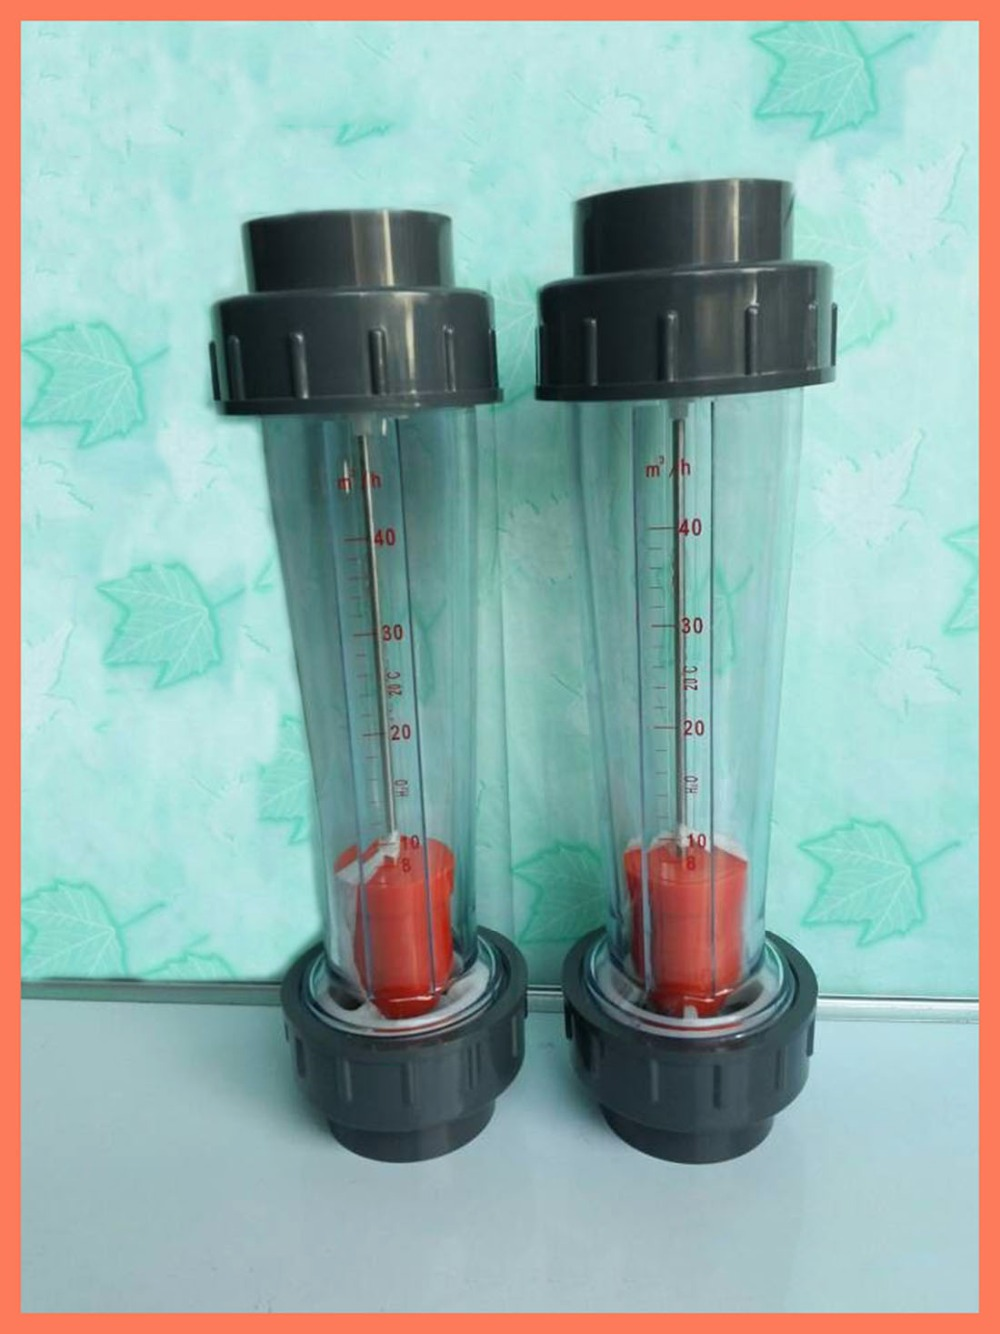 LZS-15 (10-100 L/H Long tube) Plastic pipe type rotor float liquid water meter Tools Measurement Instruments FlowMeters LZS15<br><br>Aliexpress